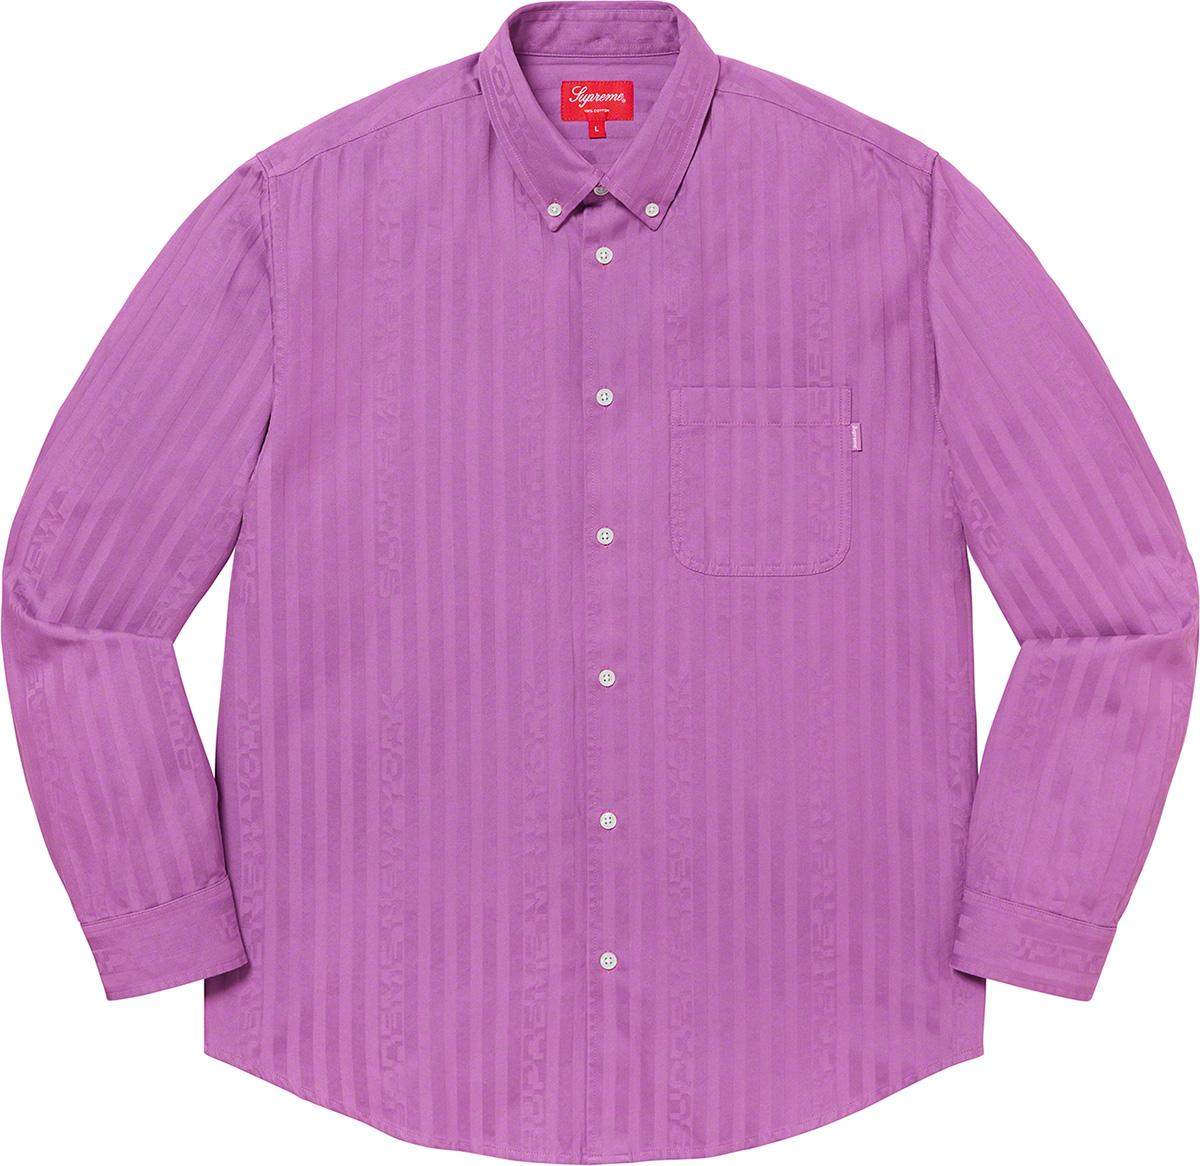 Supreme 2020fw Jacquard Stripe Twill Shirt シュプリーム ストライプ シャツ ピンク